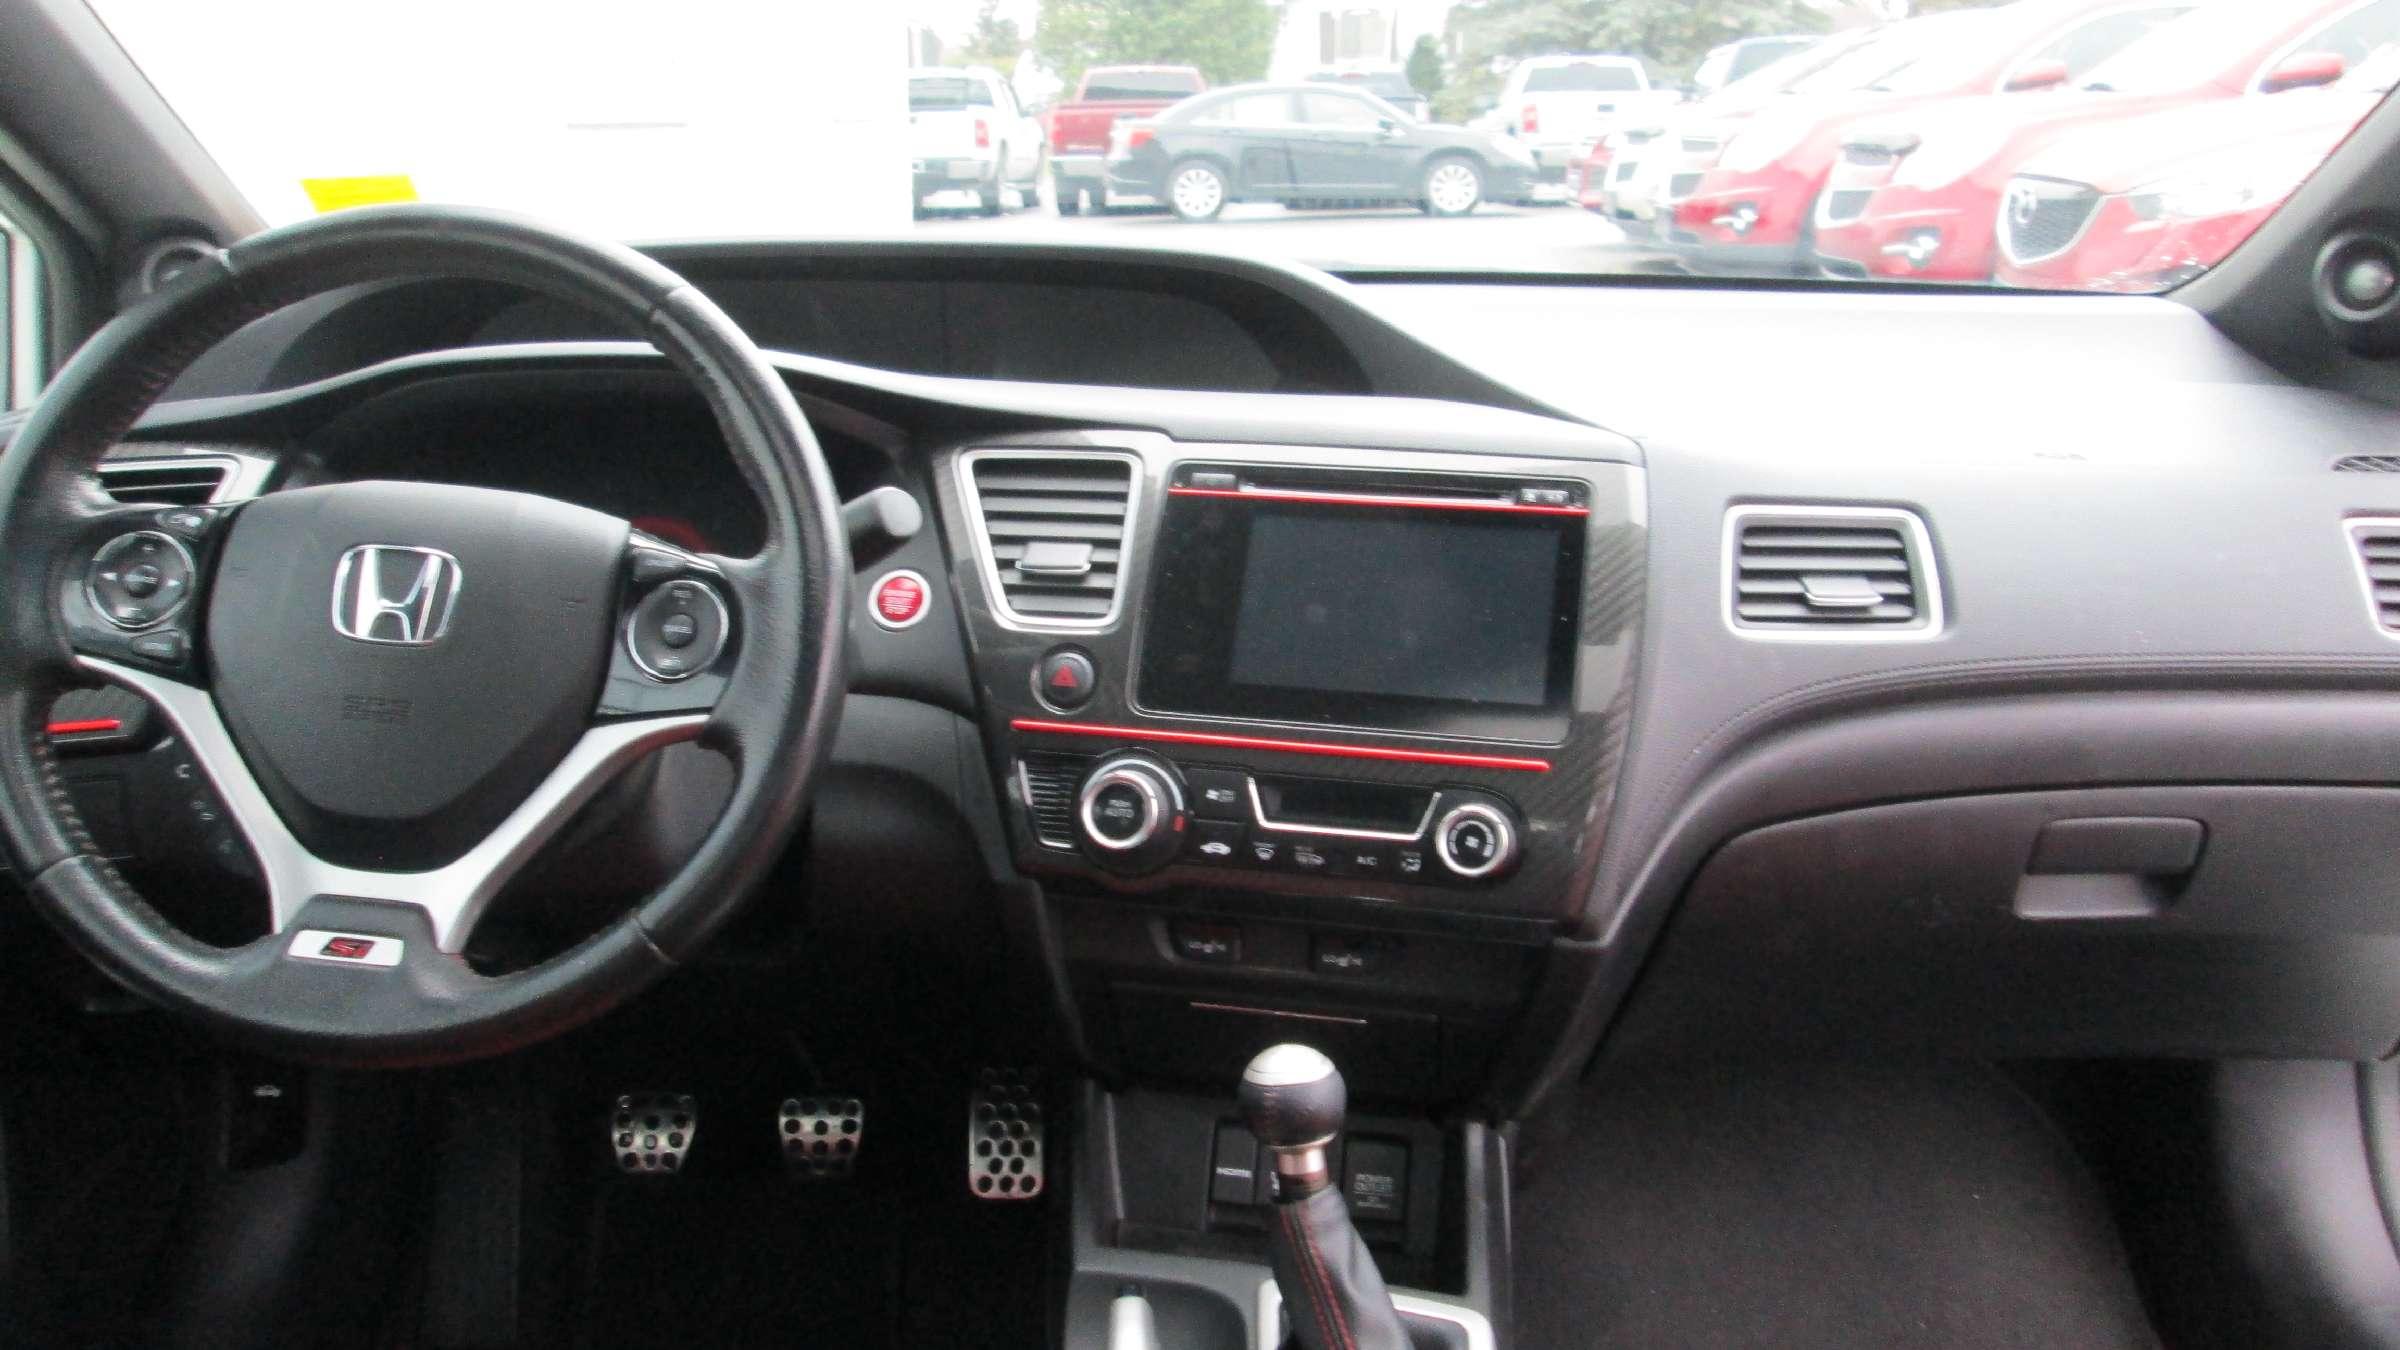 2015 Honda Civic Si (Stk: 171576) in North Bay - Image 13 of 14